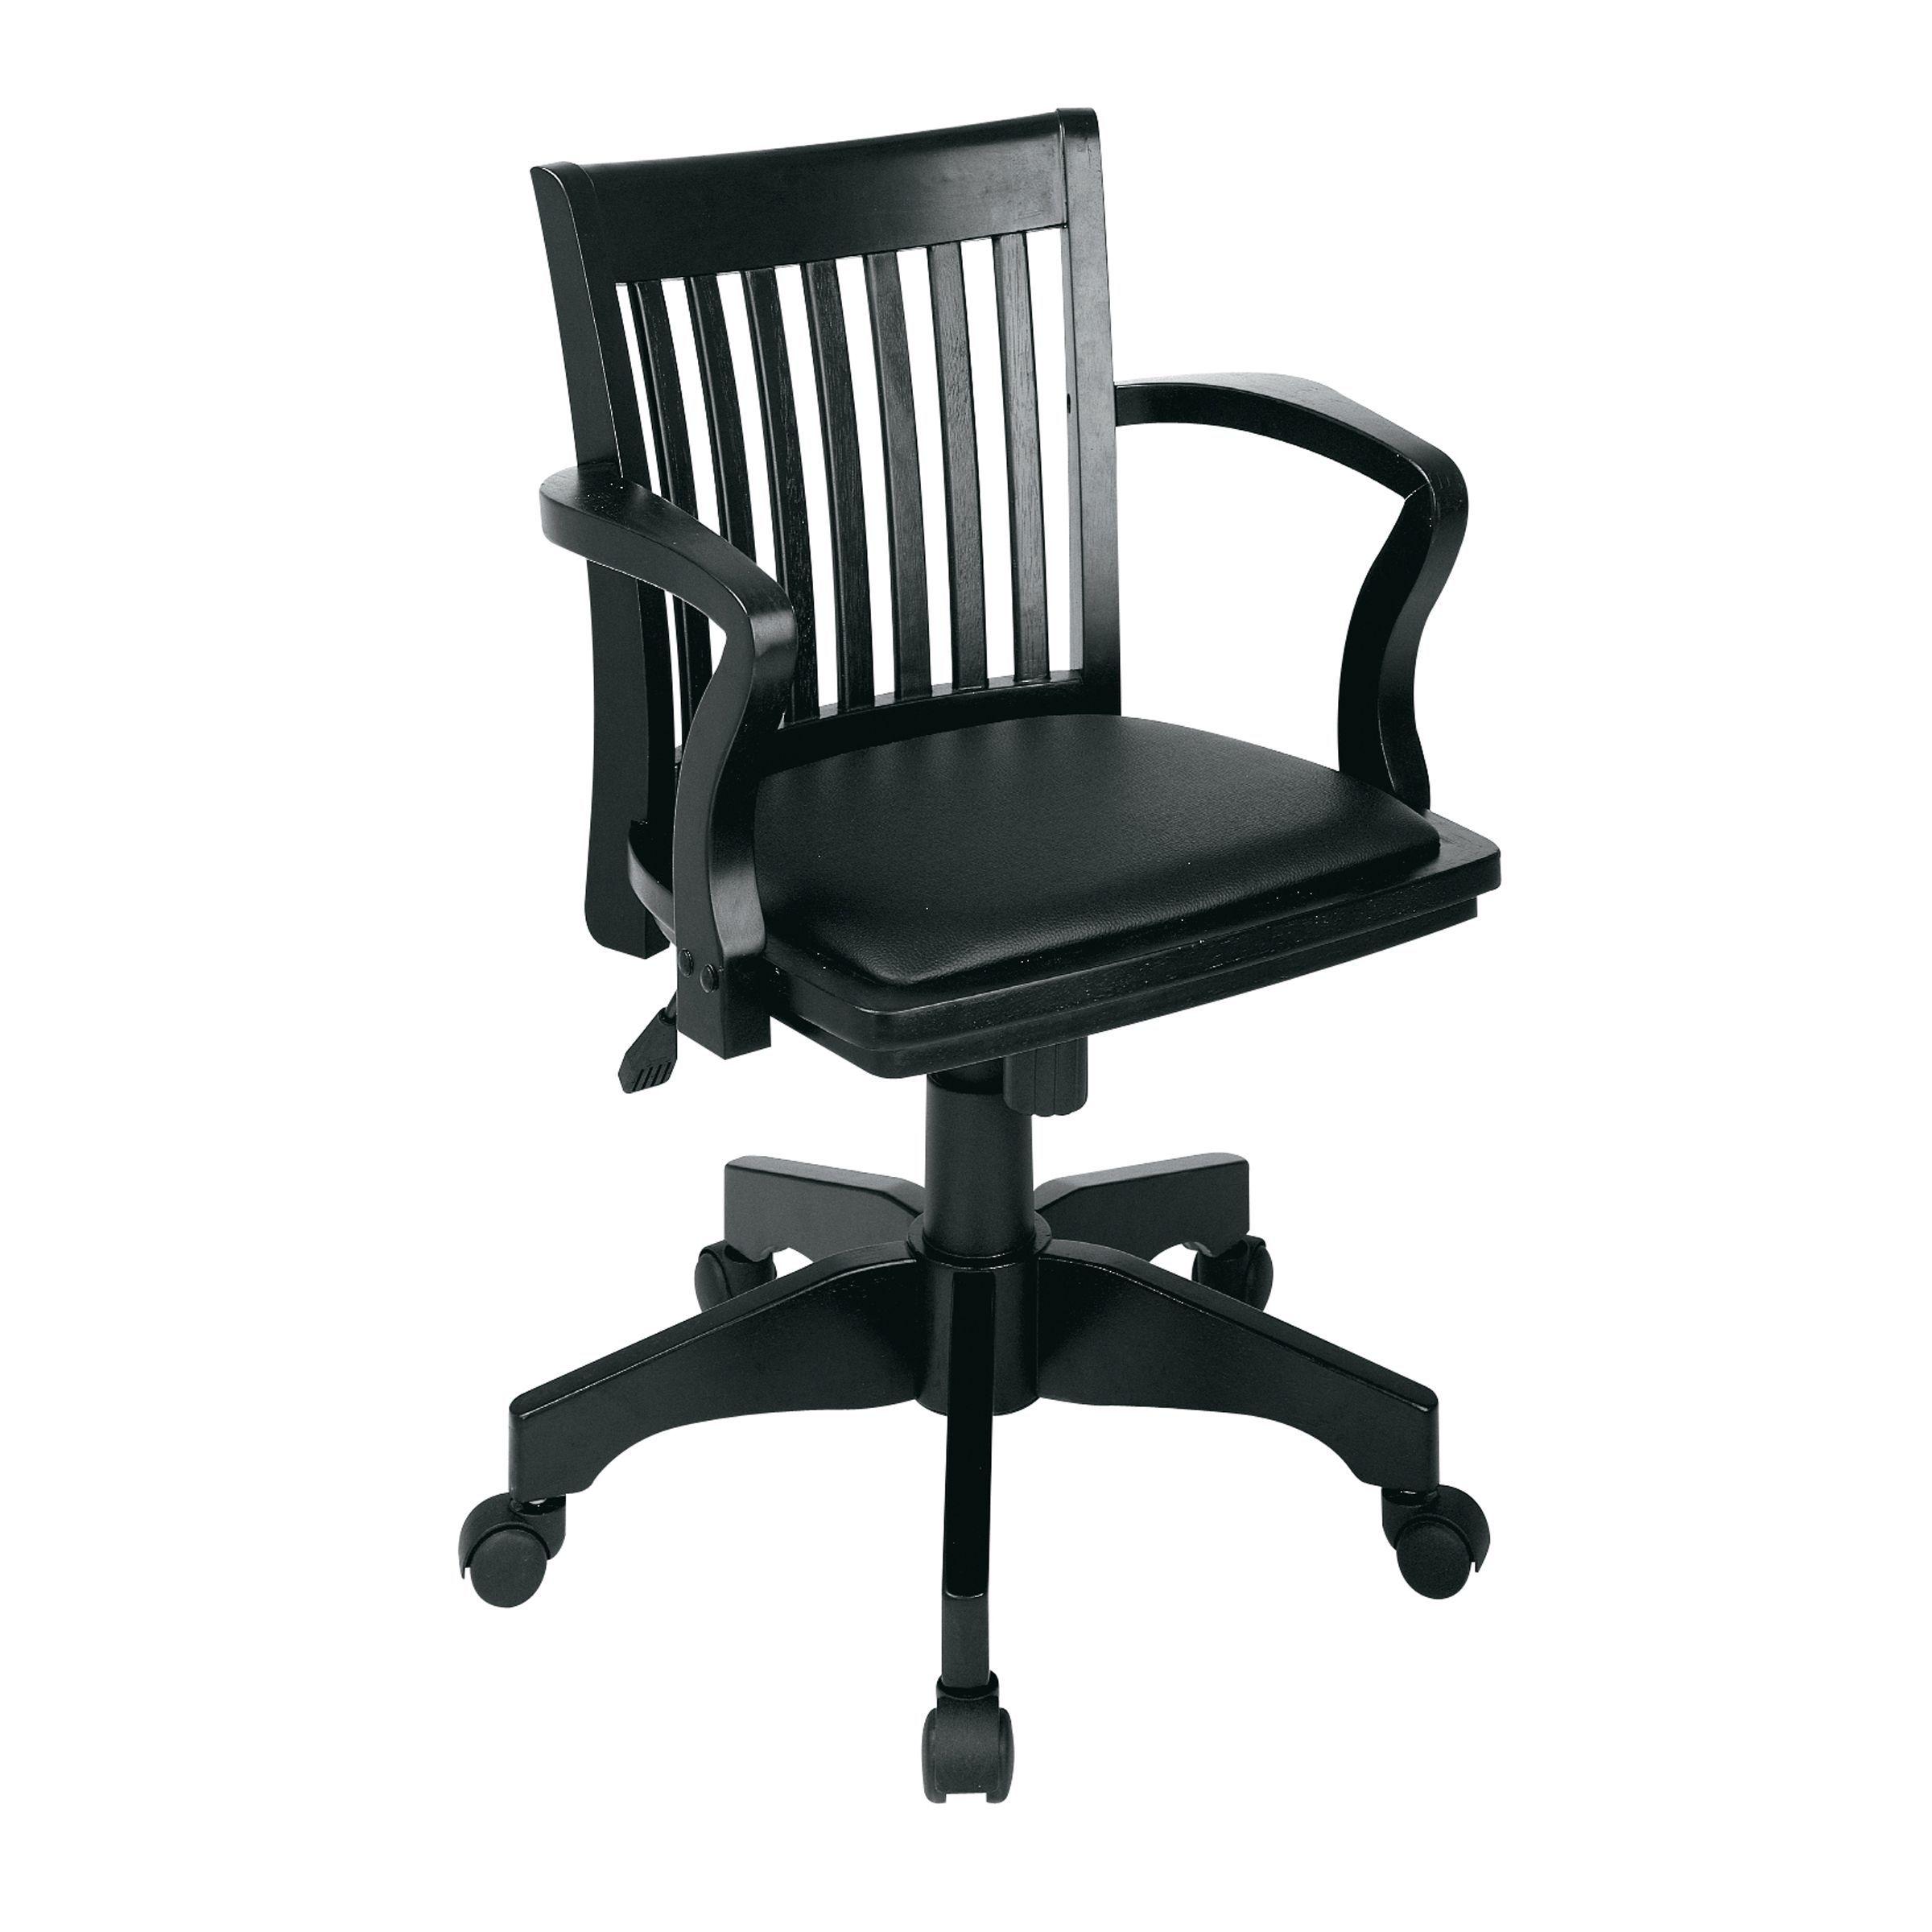 Office Star Adjustable Wood Bankersu0027 Desk Chair With Vinyl Seat    Fruitwood/Black